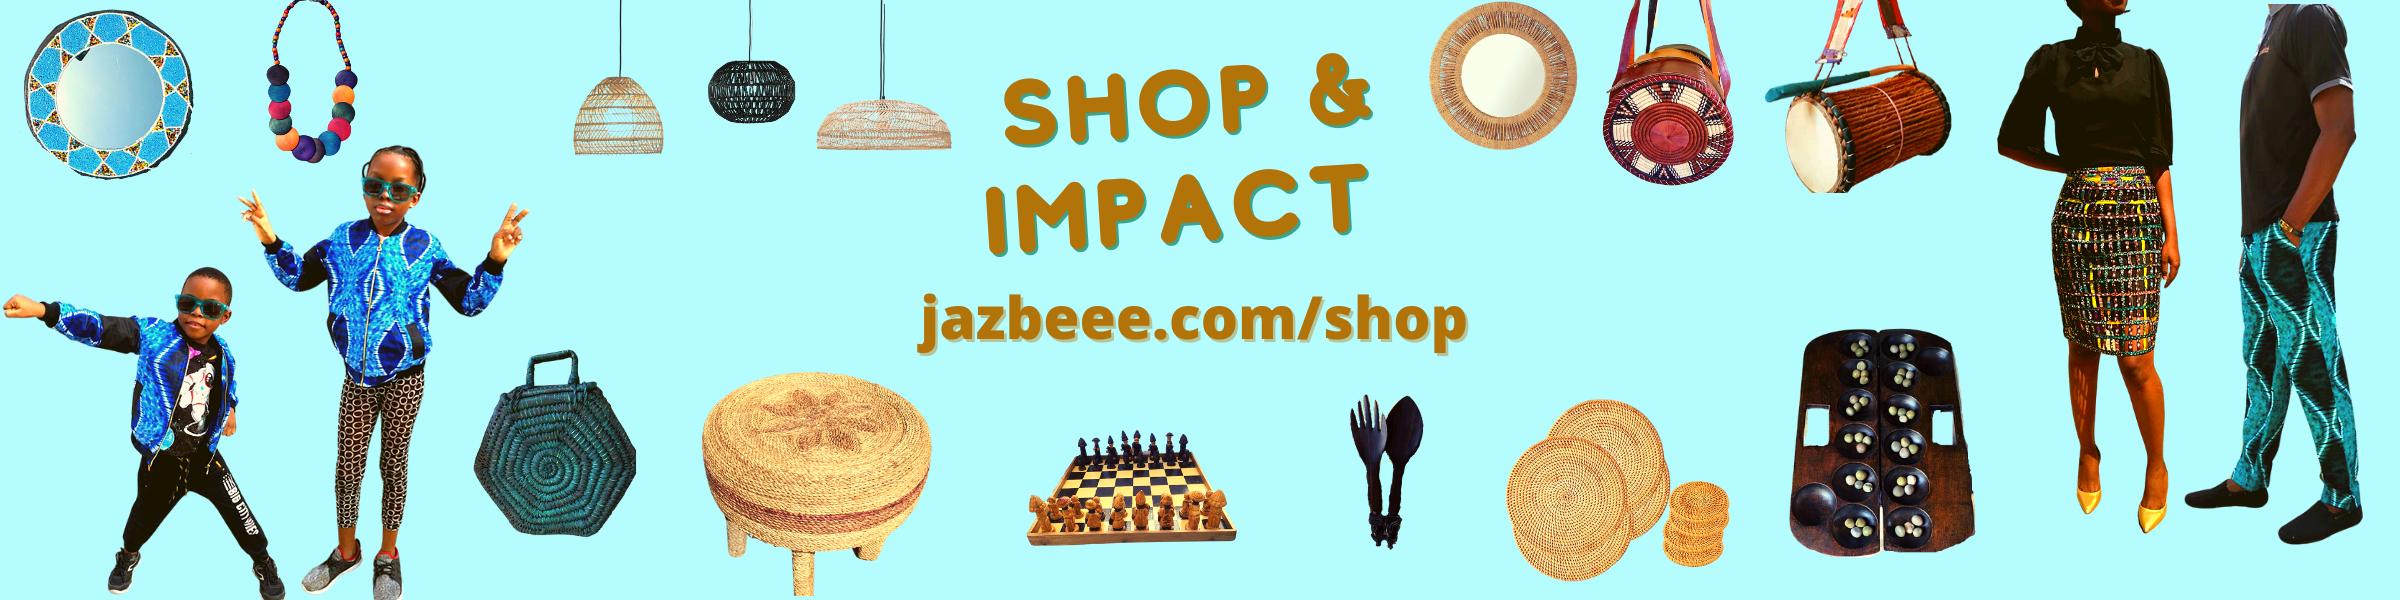 Jazbeee Lifestyle